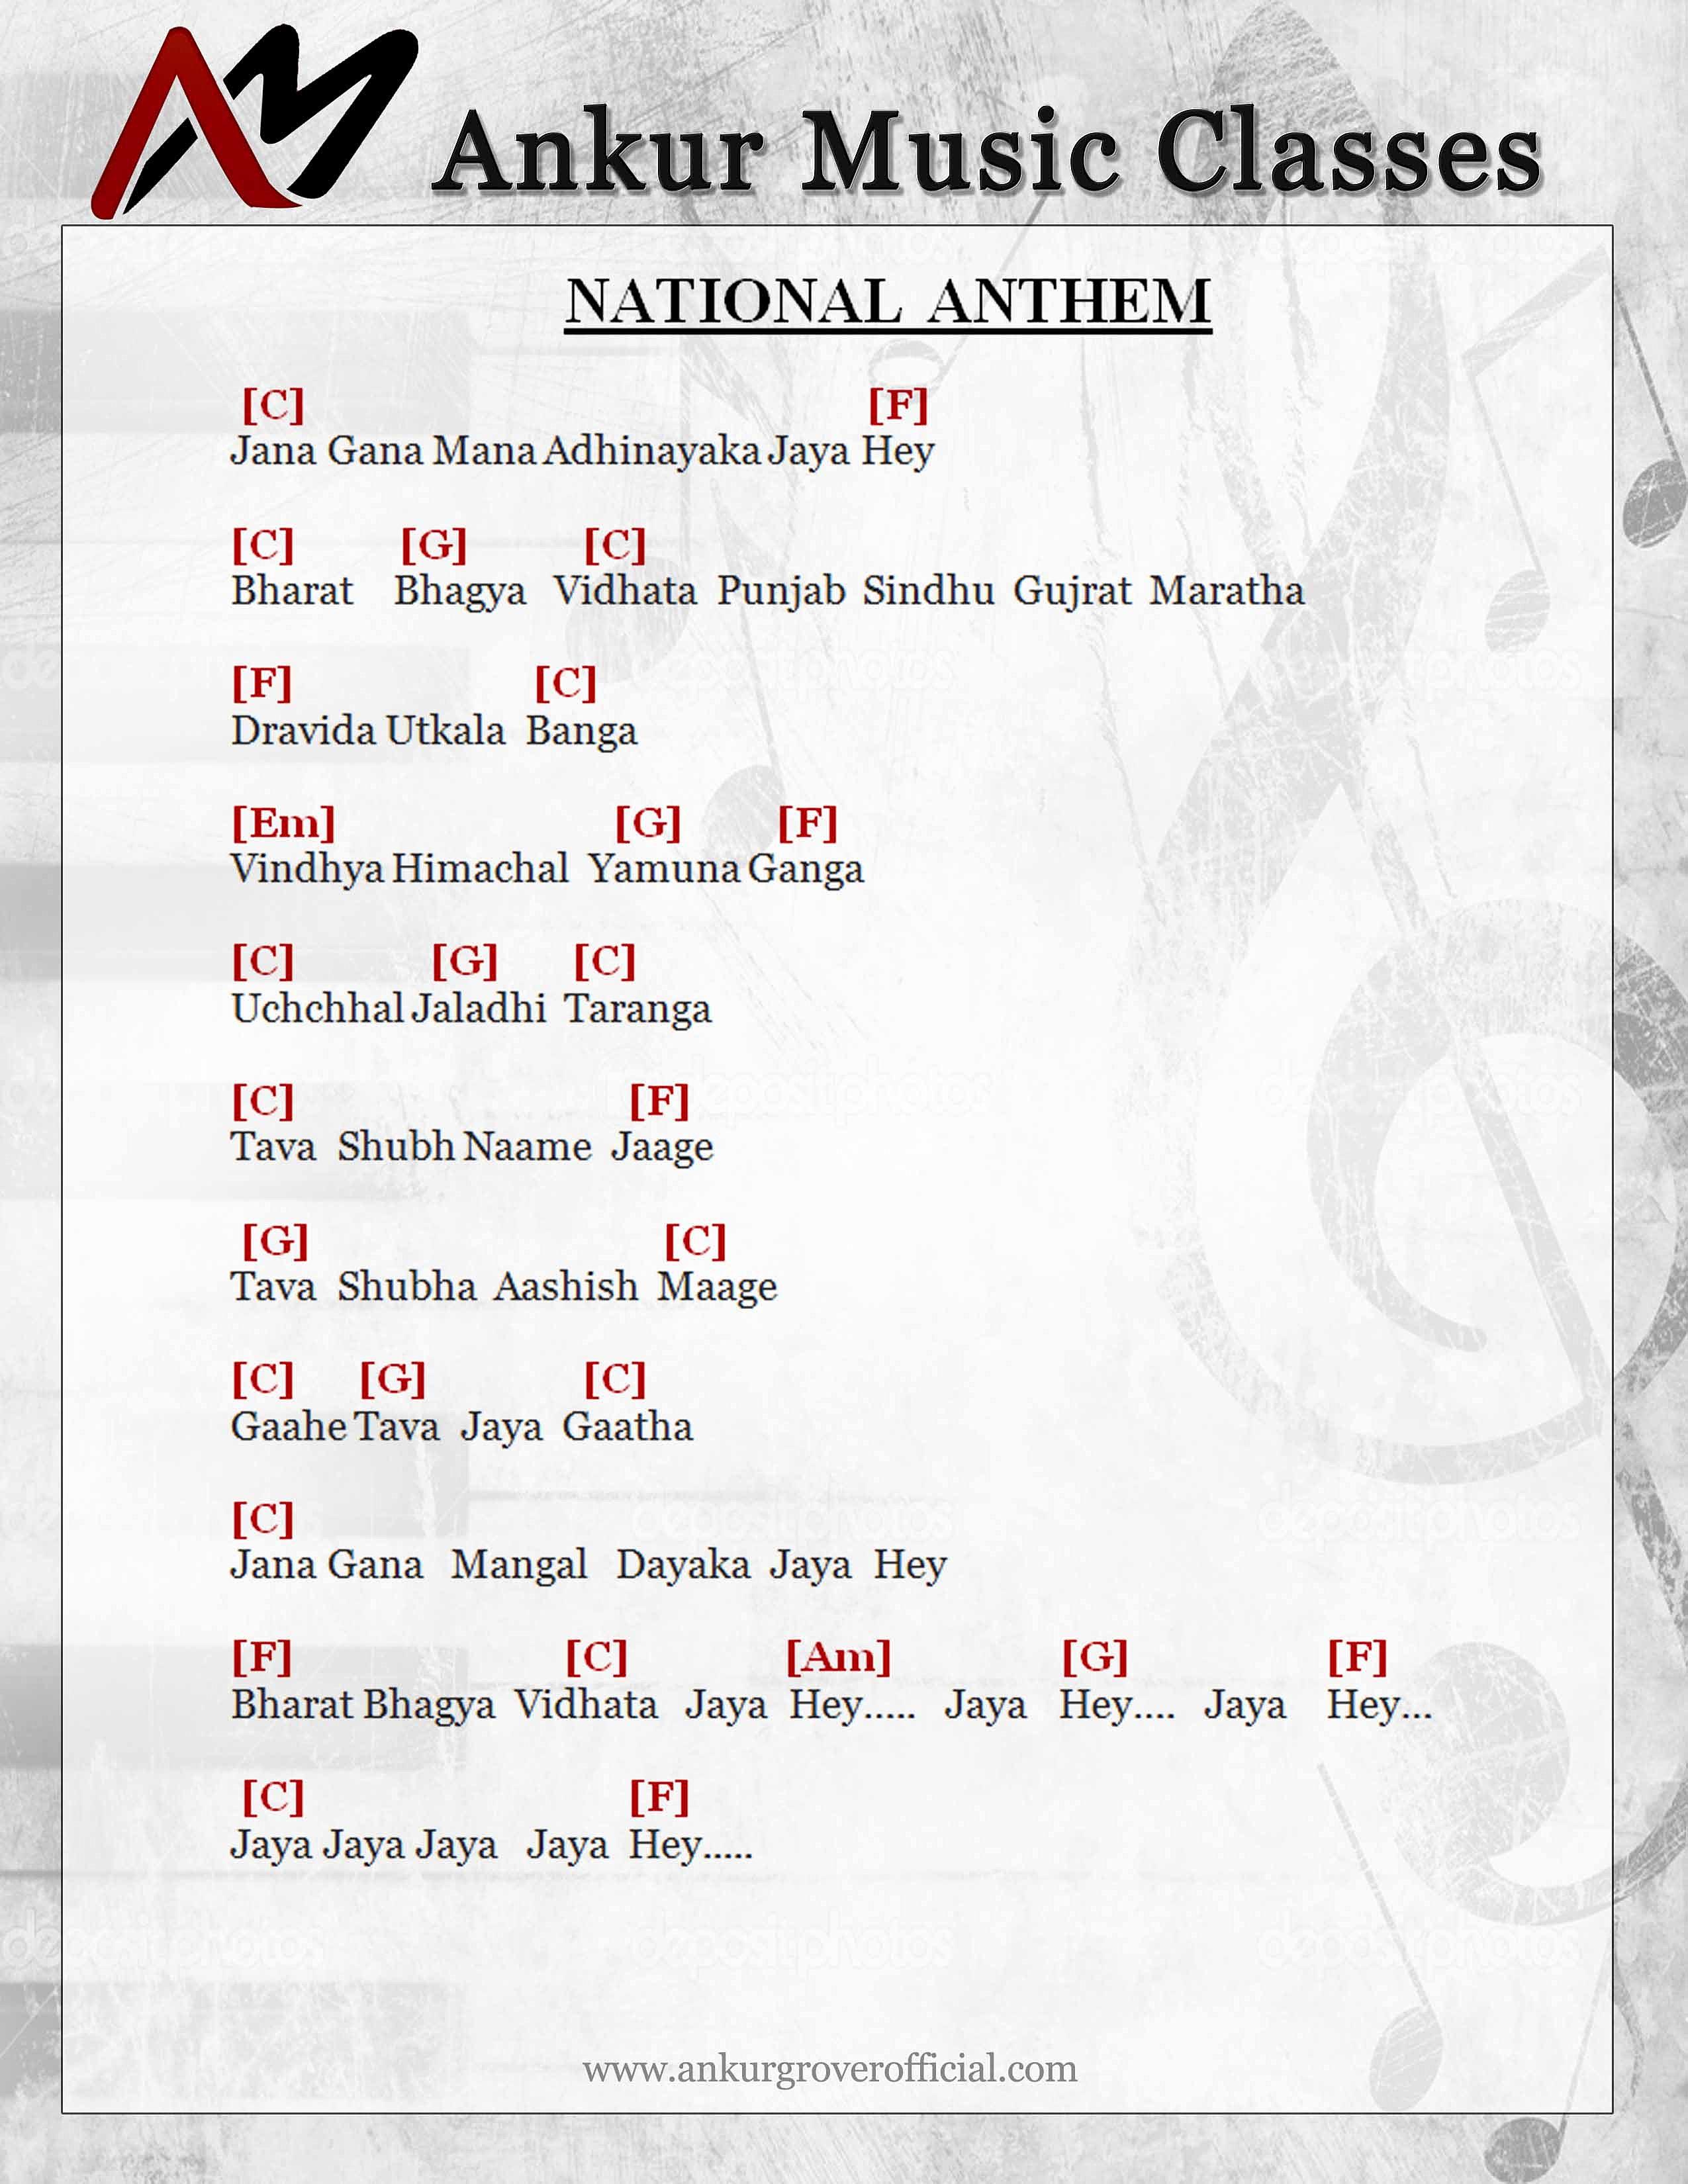 Ankur grover singer music teacher official site national indian national anthem hexwebz Choice Image